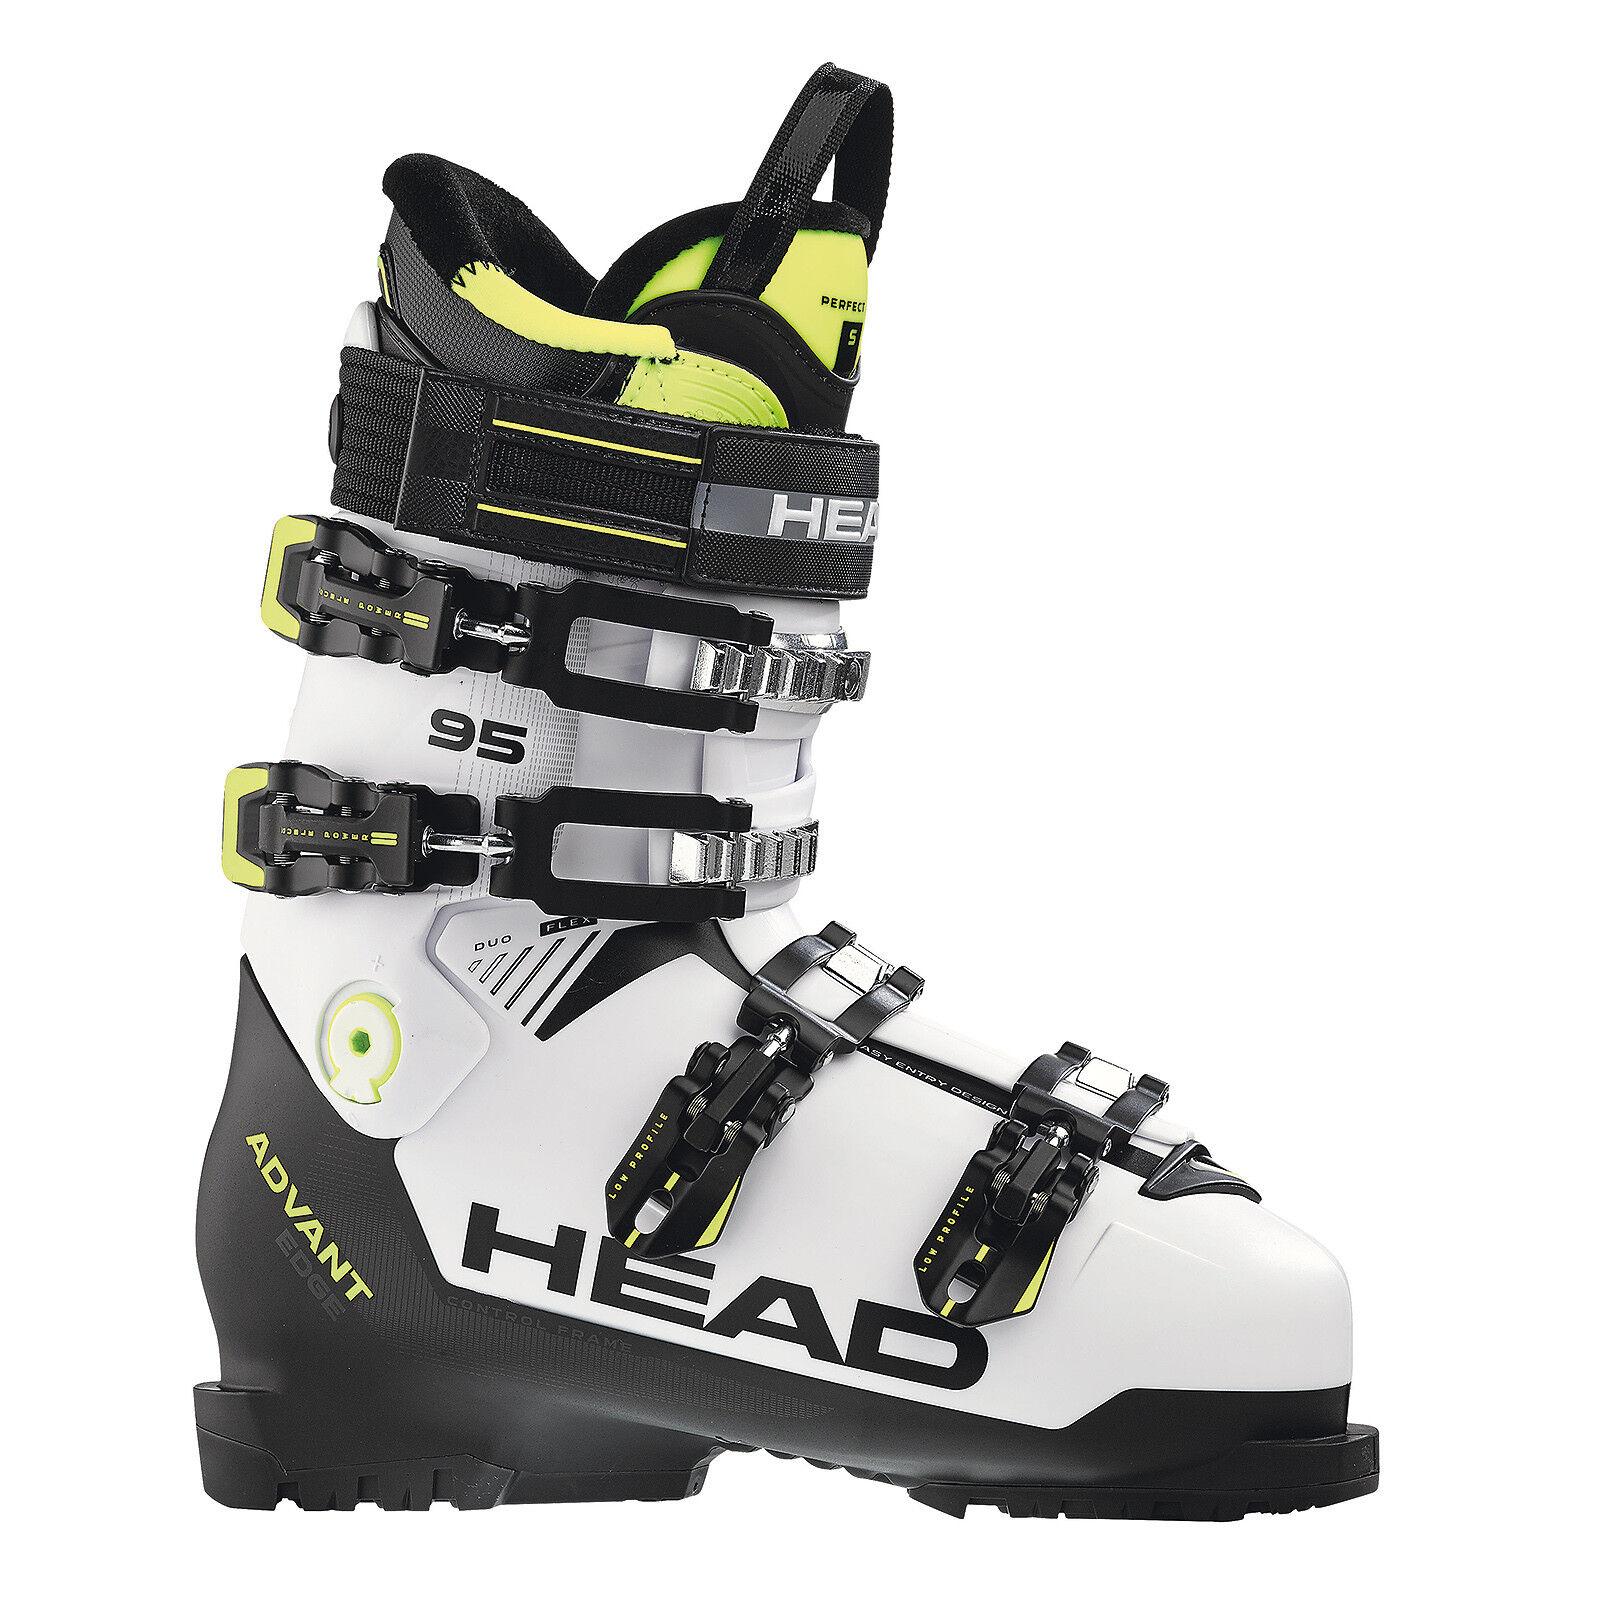 HEAD ADVANT EDGE 95 Skischuh Skistiefel UNISEX Collection 2019 NEU